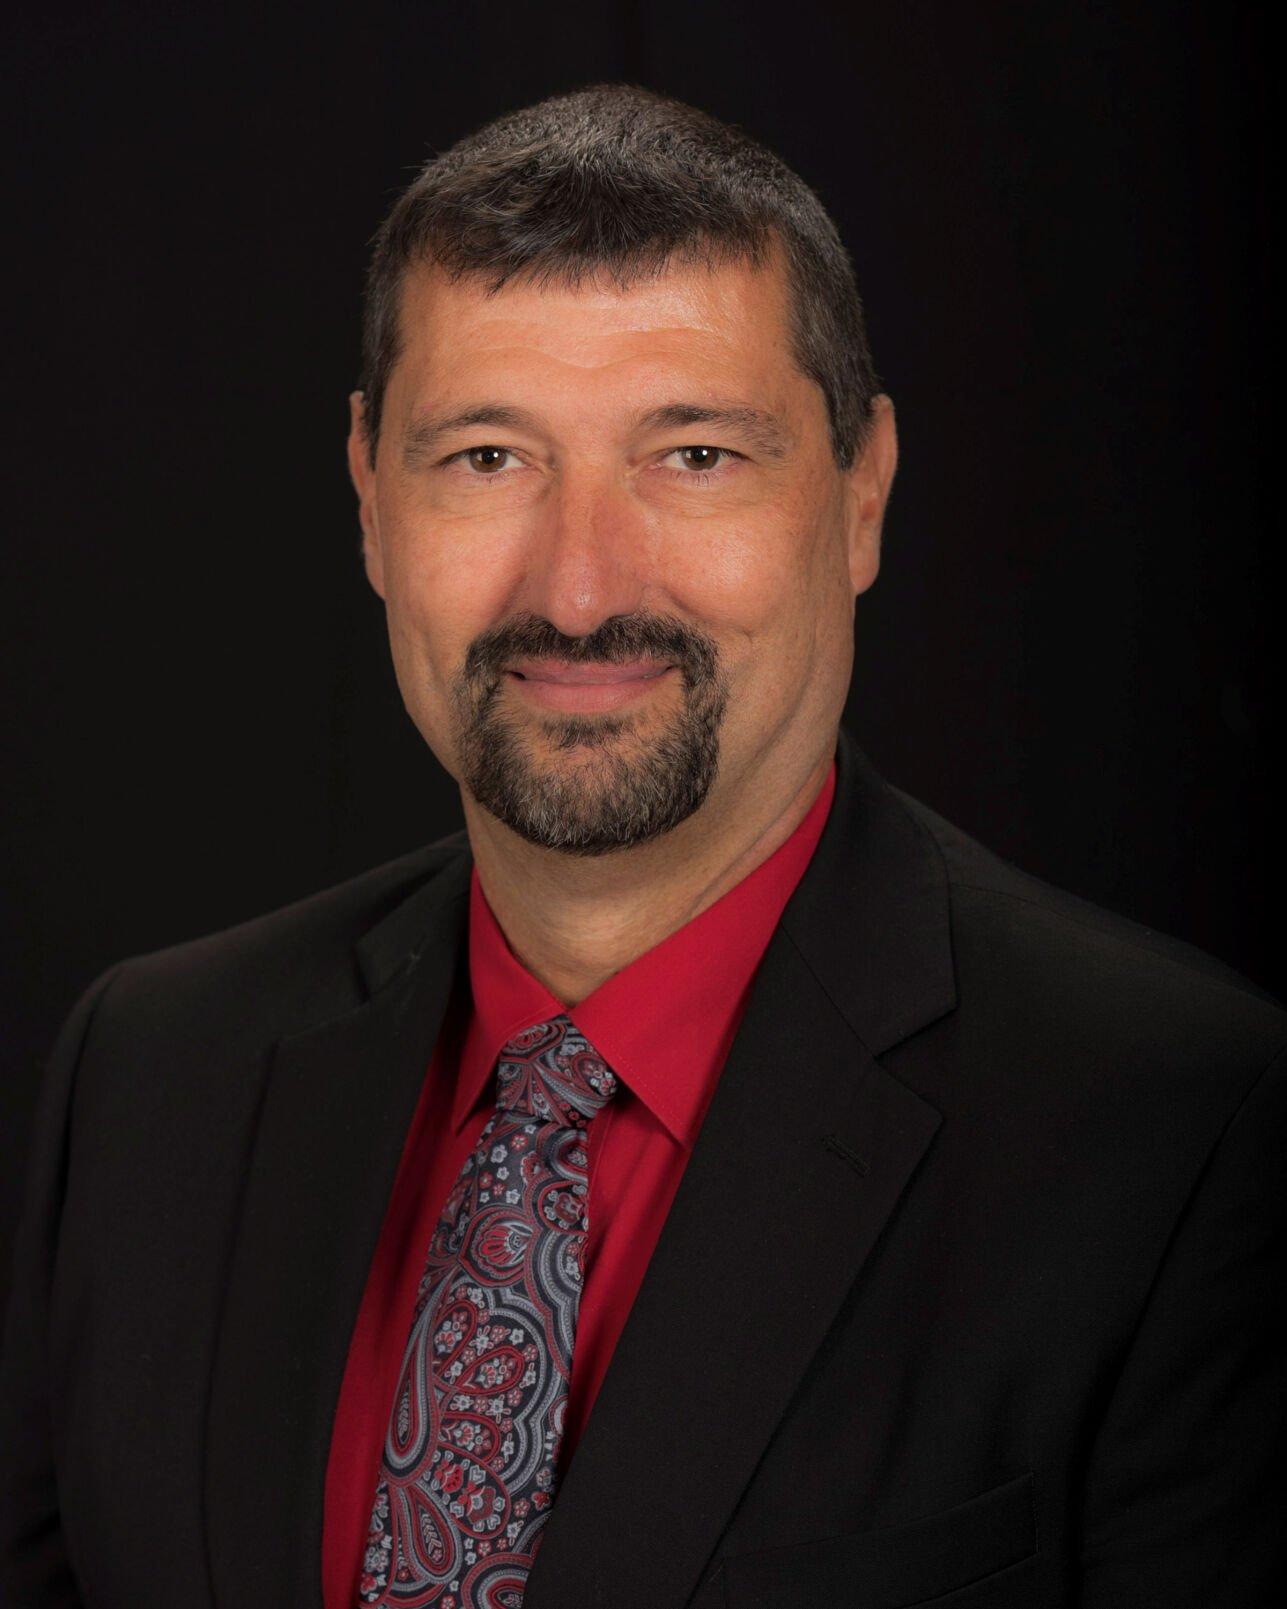 Rep. Mark Pless